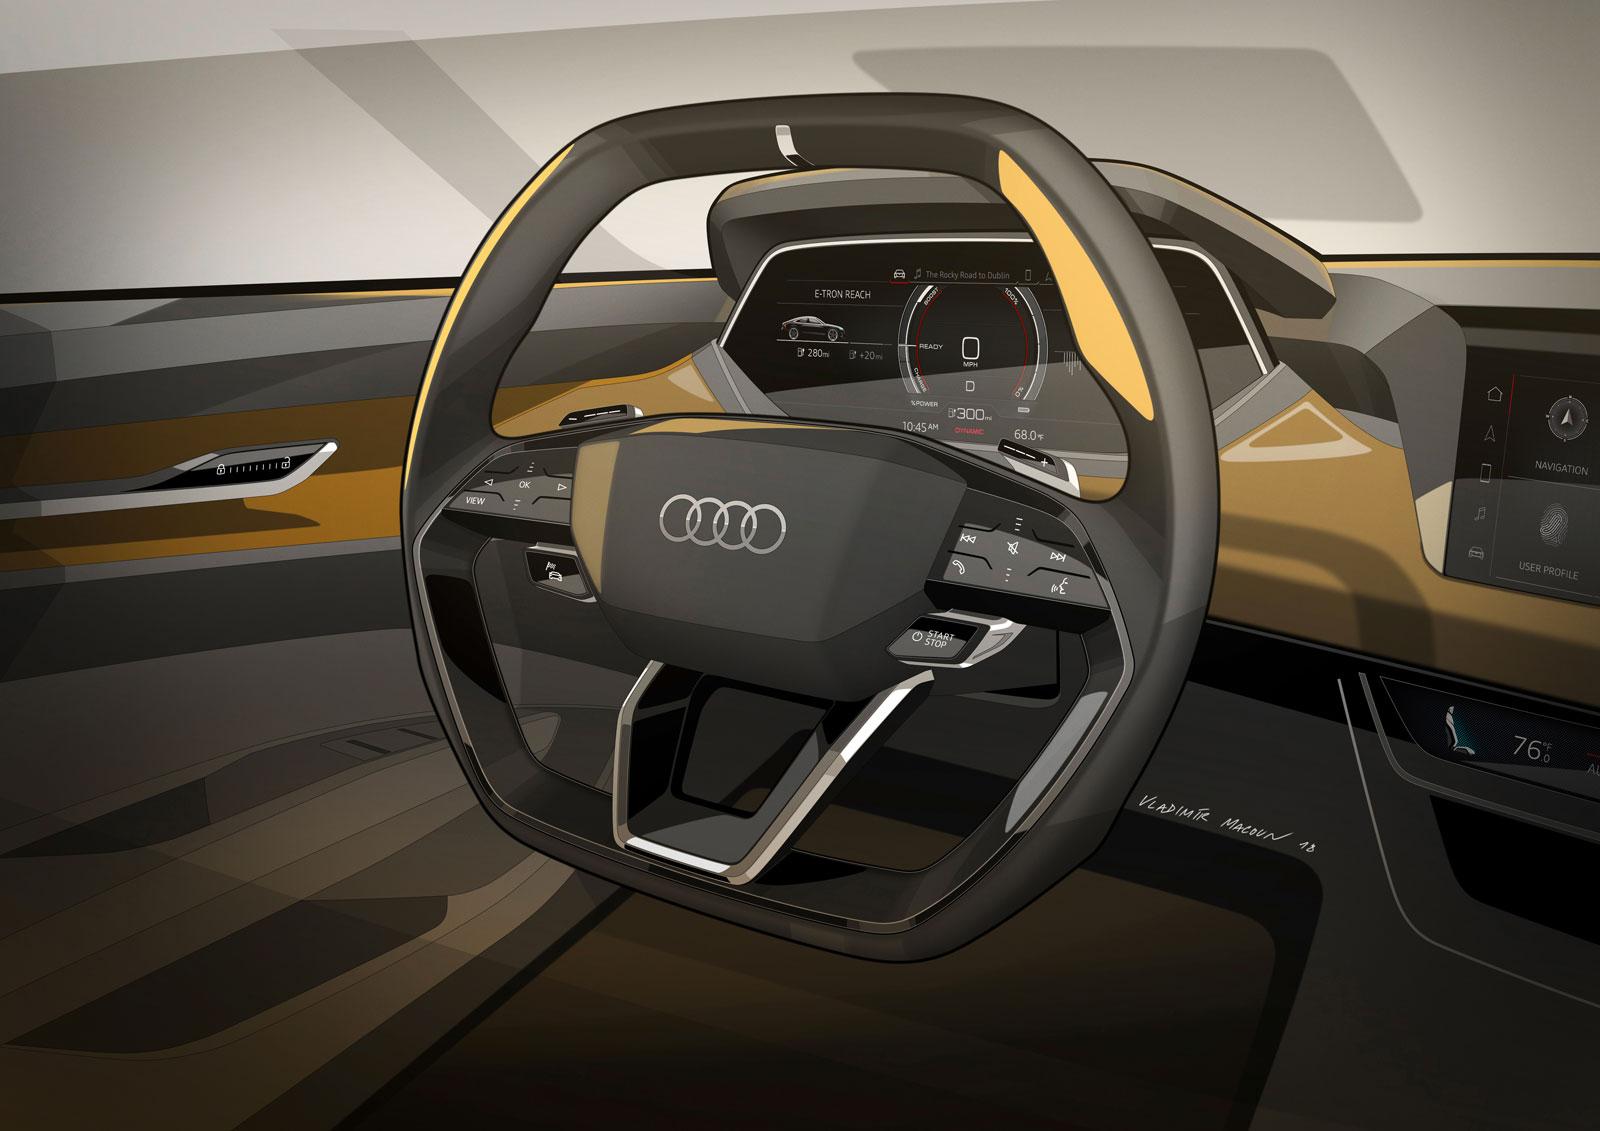 Audi E Tron Gt Concept Interior Design Sketch Render Steering Wheel Car Body Design